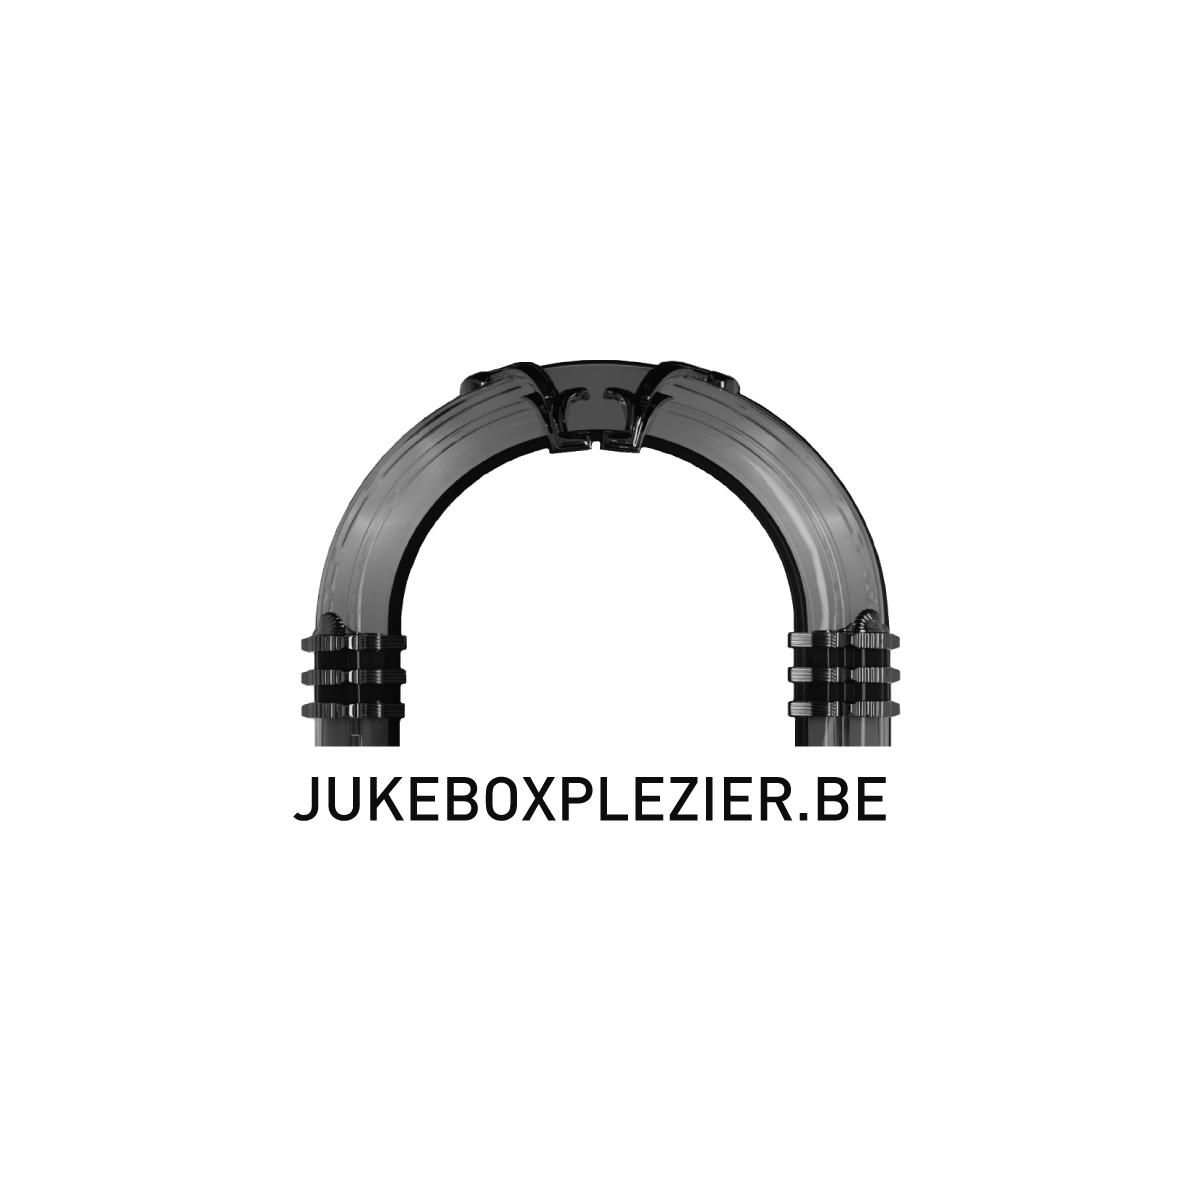 Jukeboxplezier